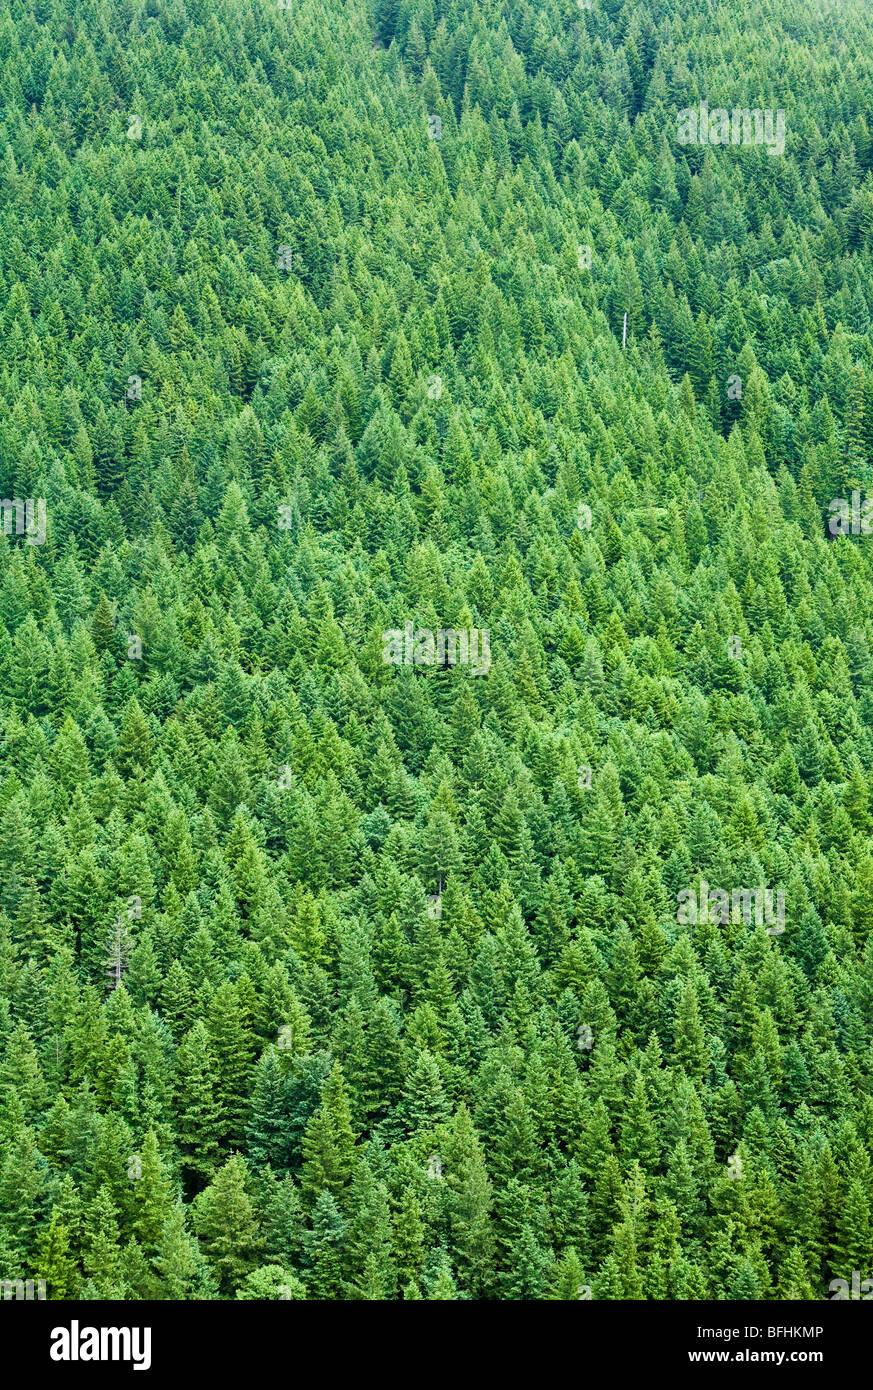 A conifer forest on a mountainside, Mt Si, Washington Cascades, USA - Stock Image